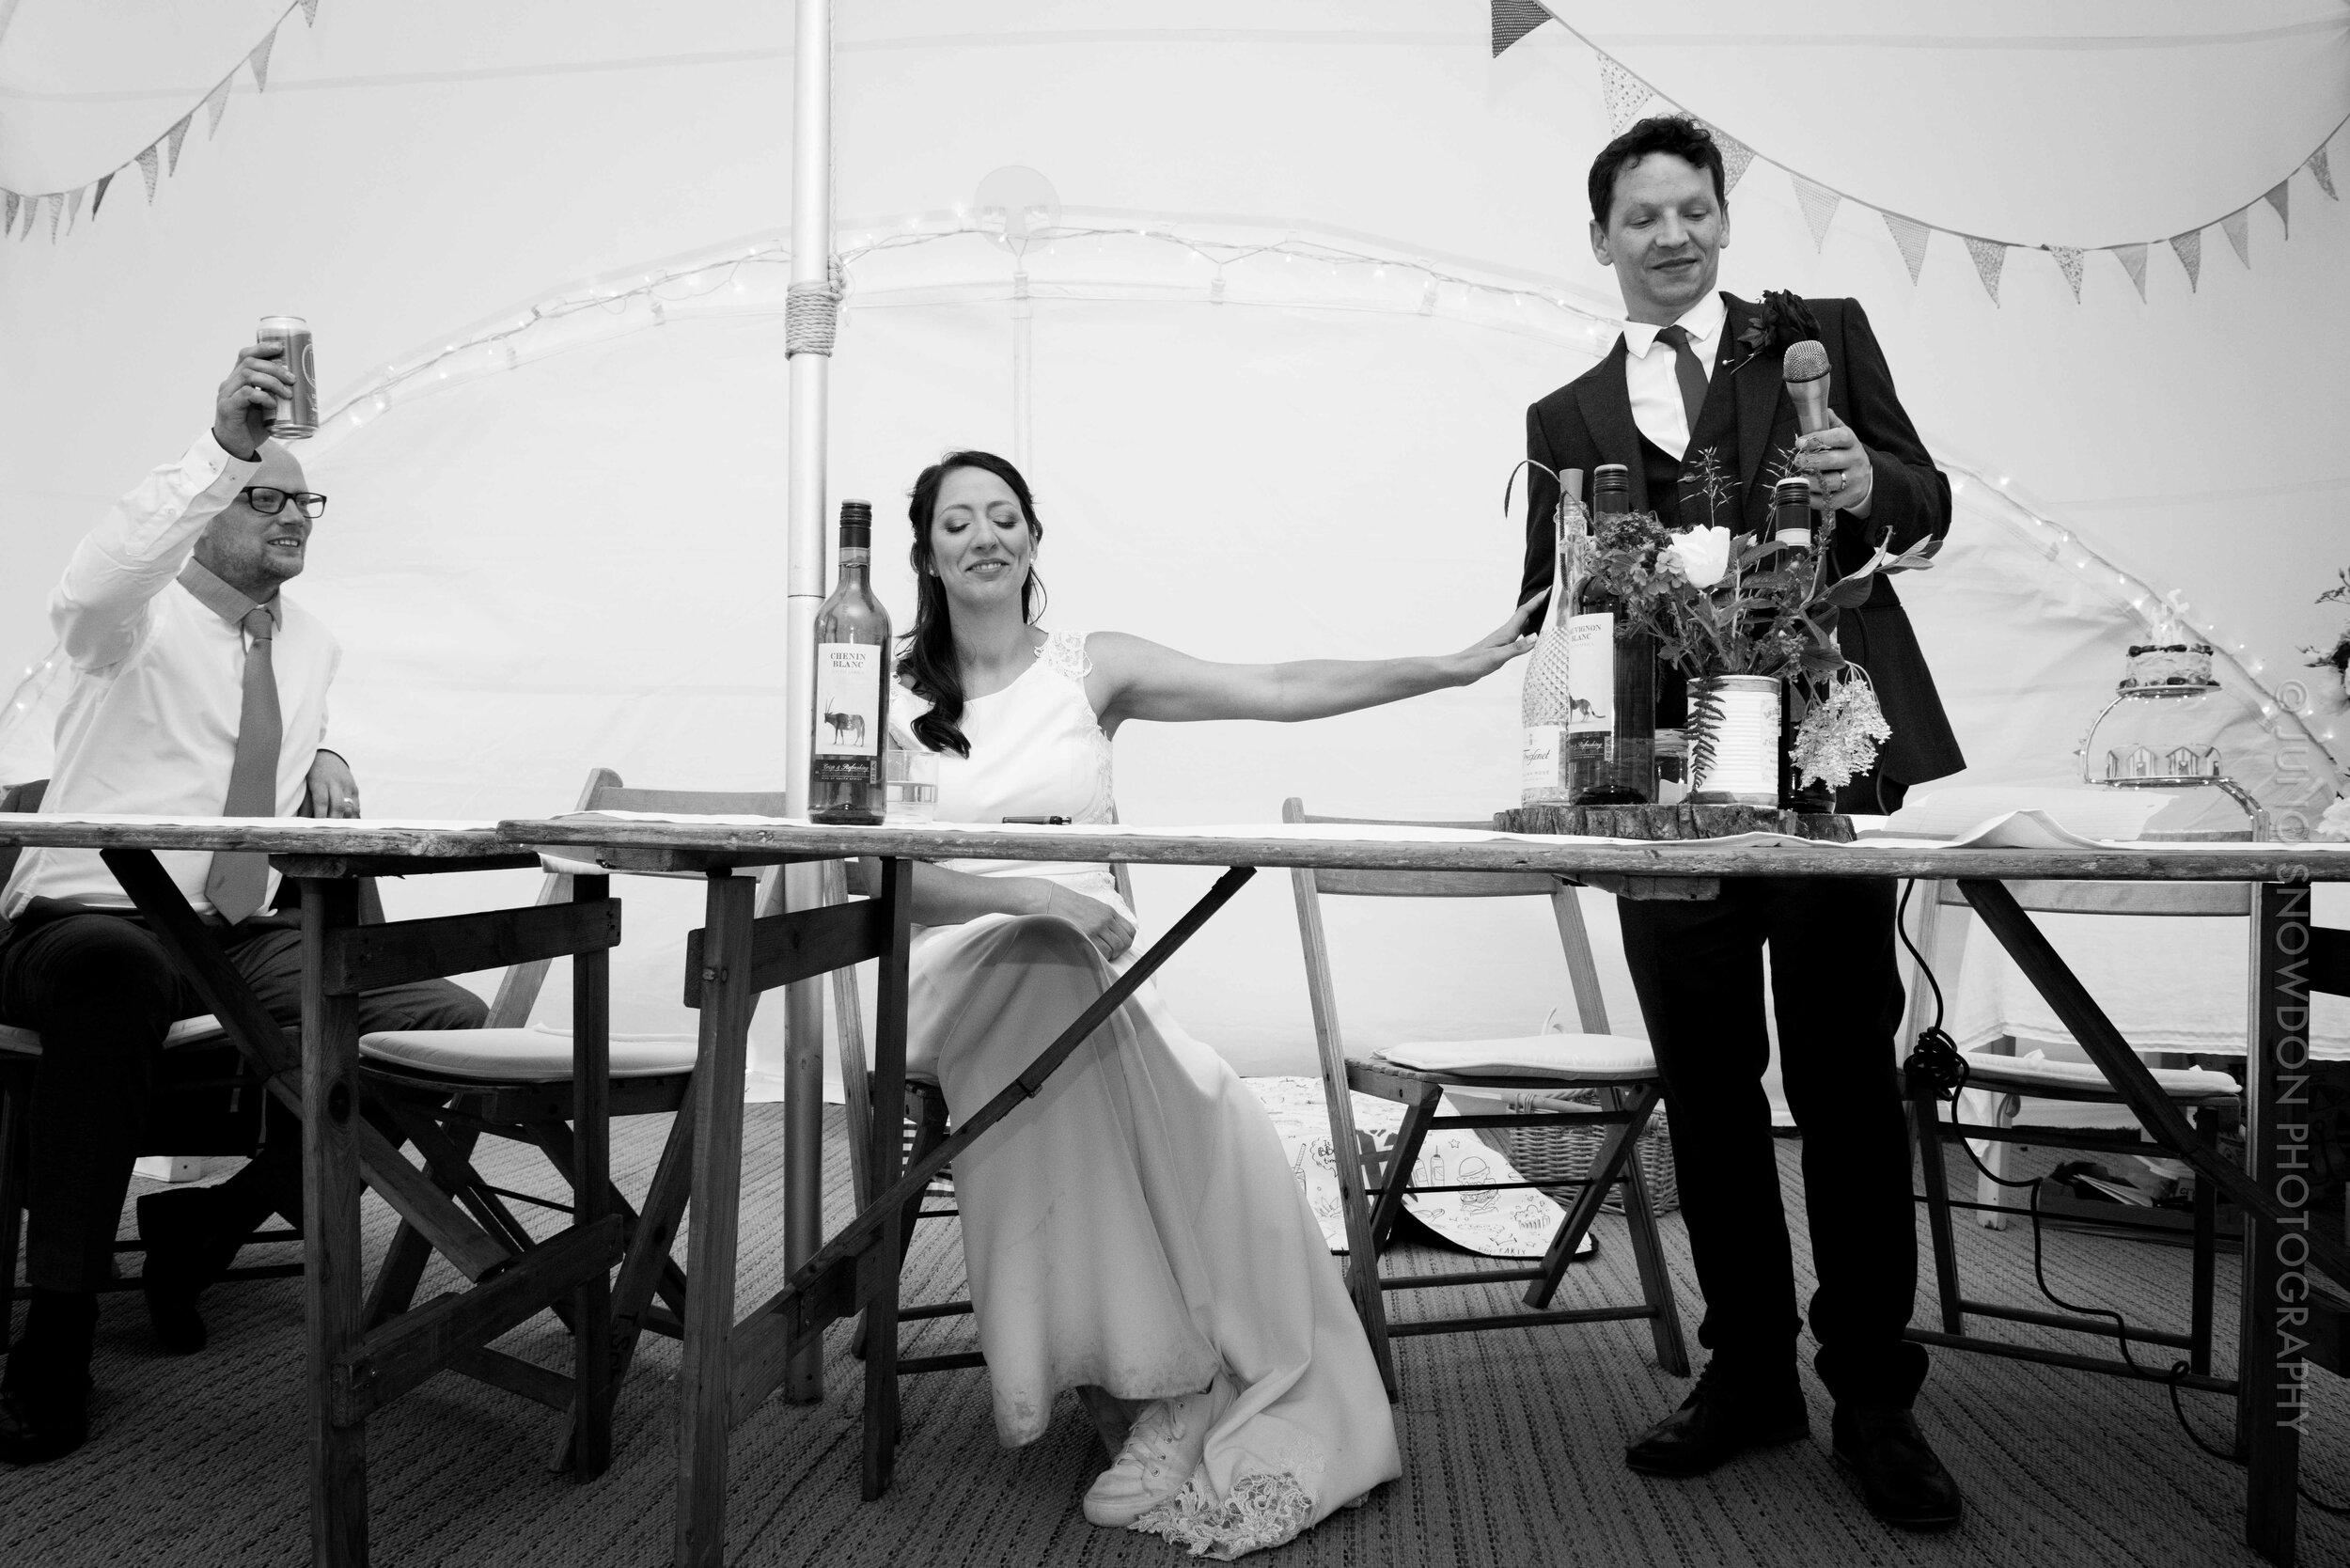 juno-snowdon-photography-wedding-8375.jpg